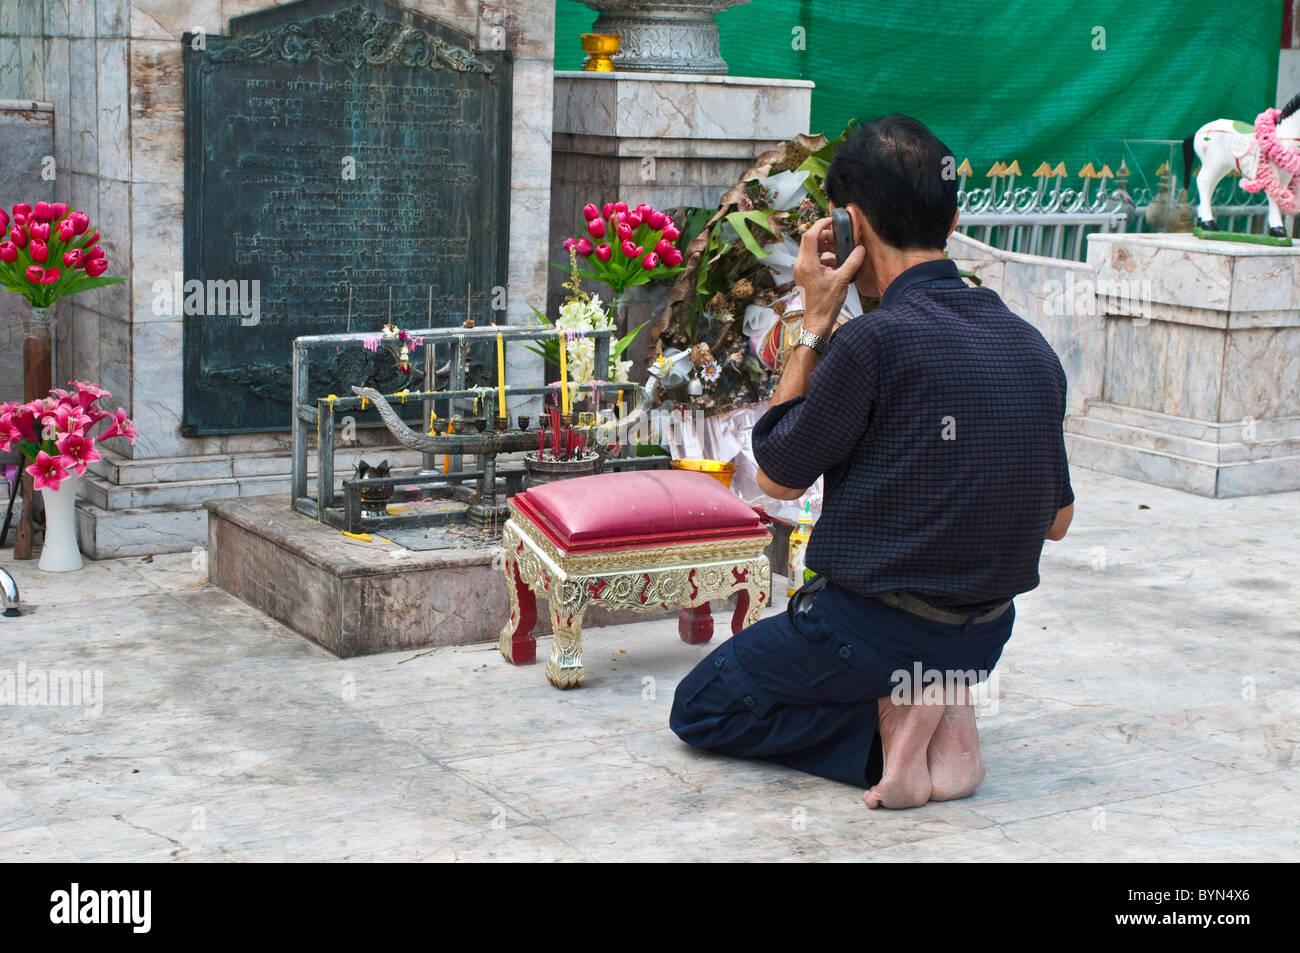 Worshiper at shrine talking on his mobile, Wat Mahannapharam Worawiharn, Bangkok, Thailand - Stock Image